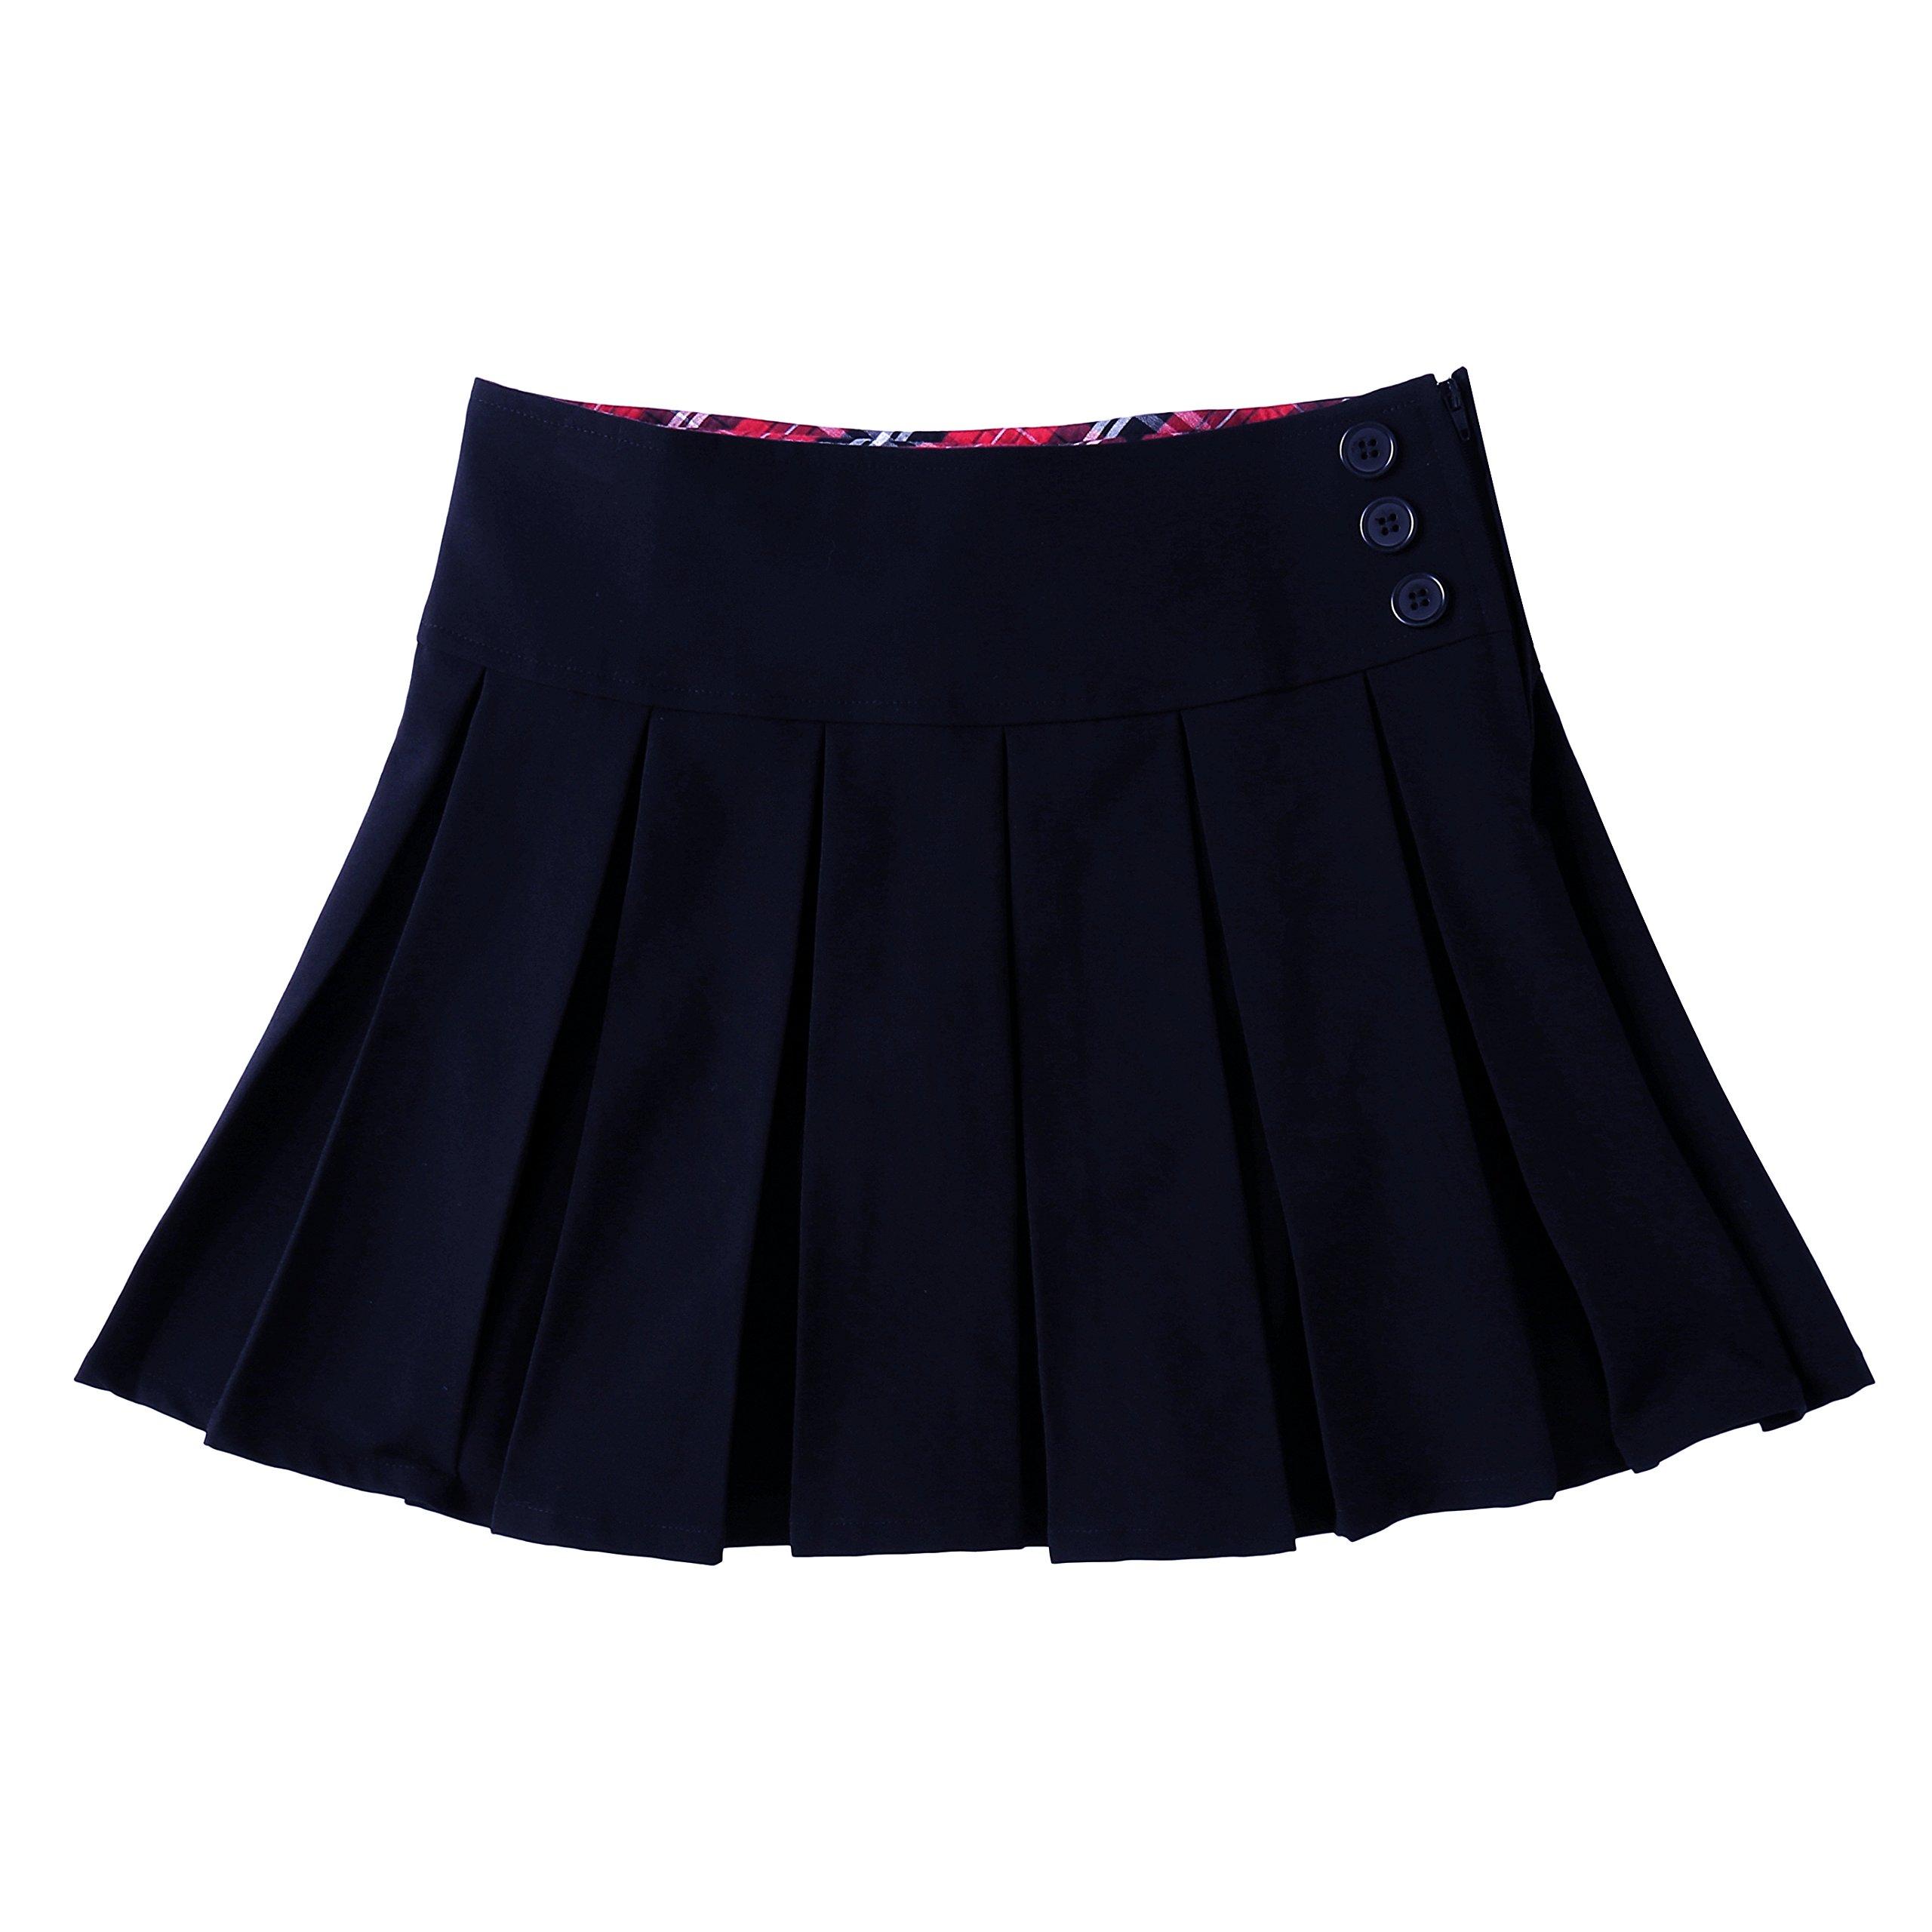 Bienzoe Girl's Pleated Hem School Uniform Skirt Navy 5